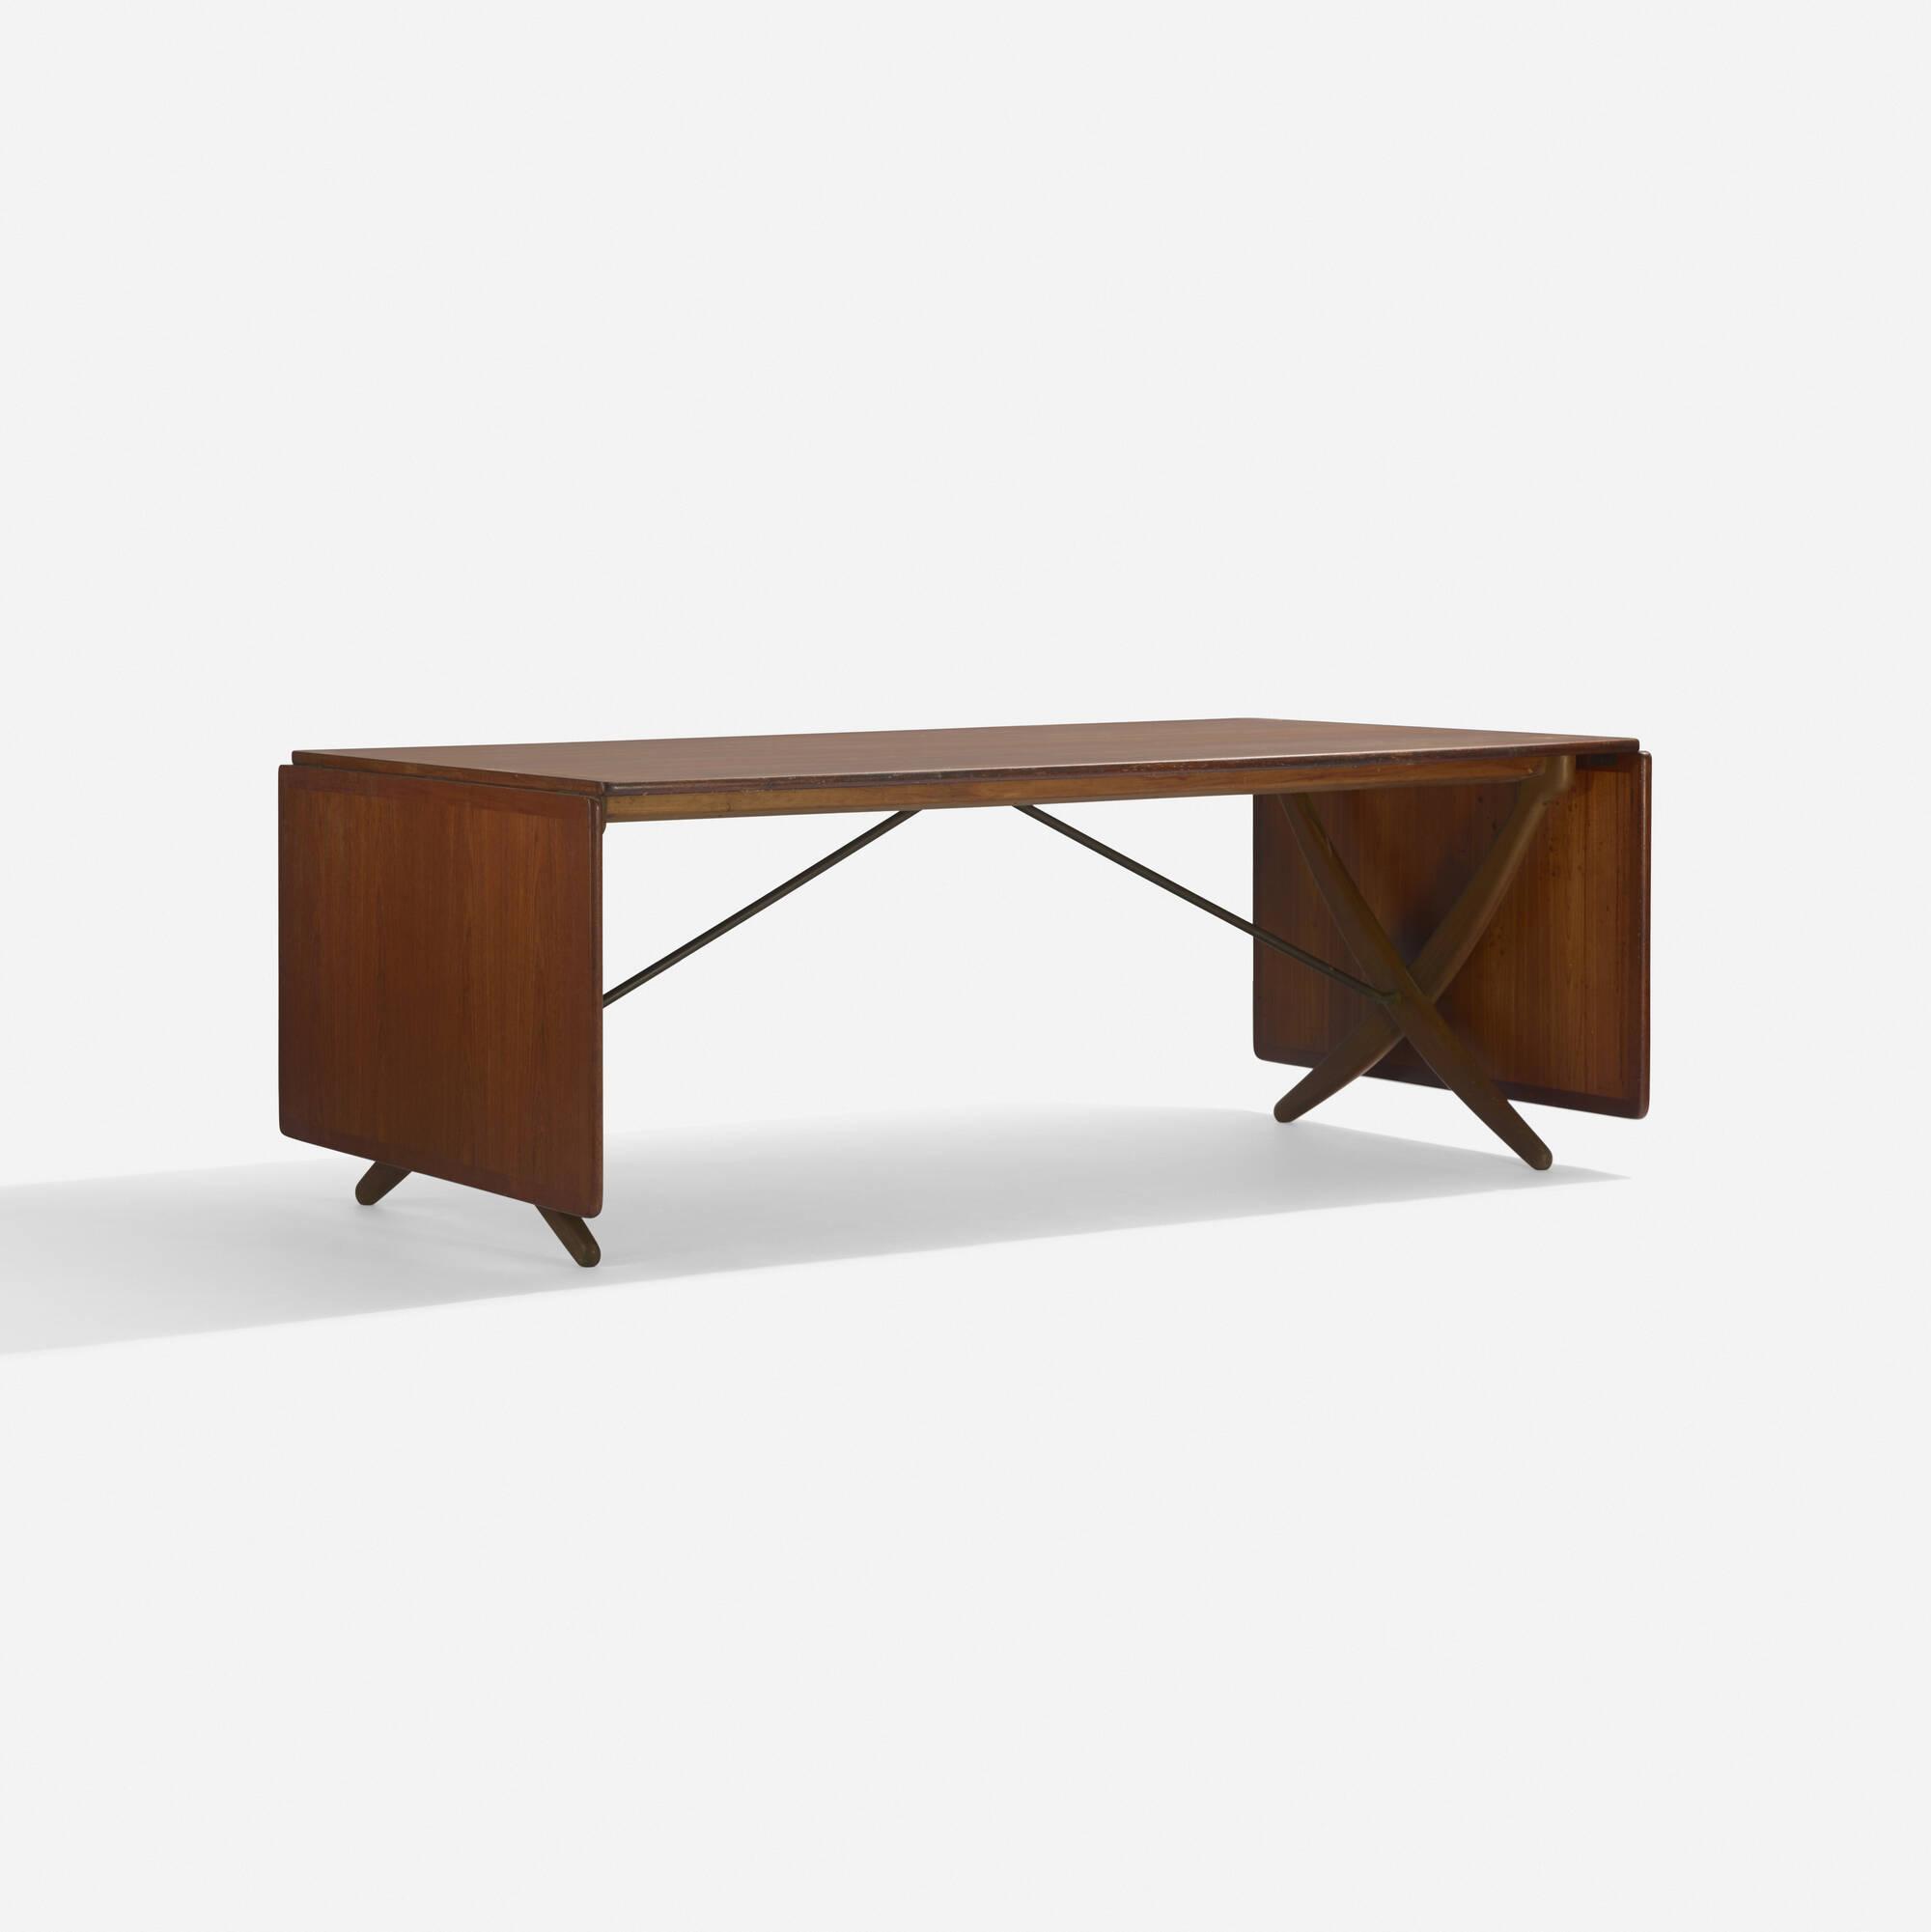 101: Hans J. Wegner / drop-leaf dining table, model AT304 (1 of 3)